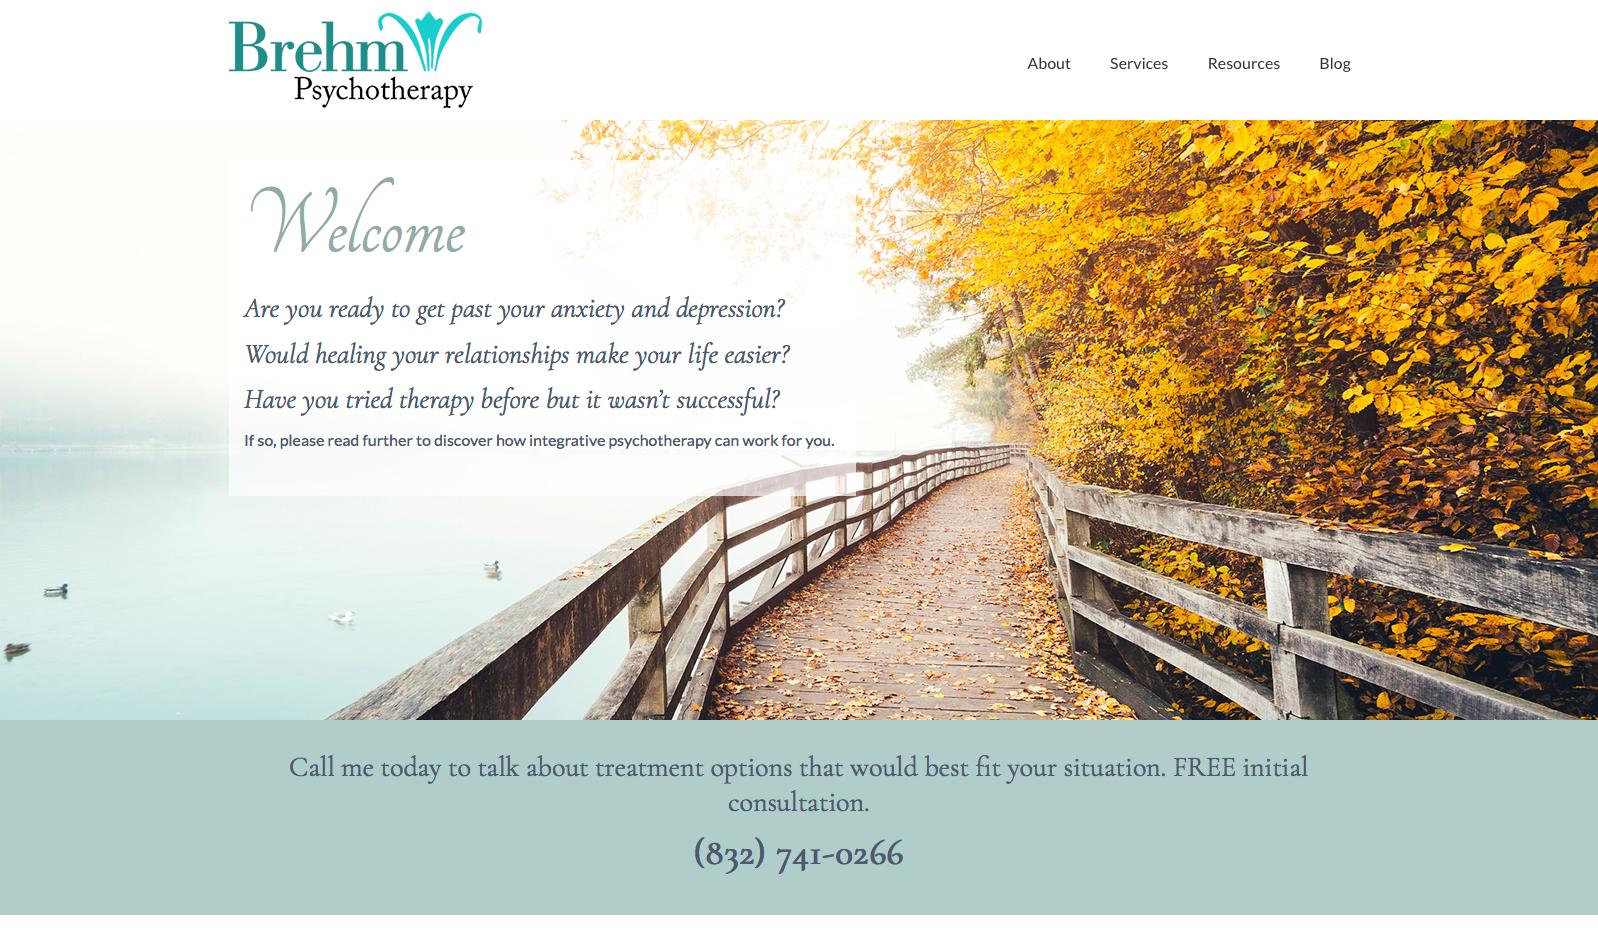 Brehm Psychotherapy web site